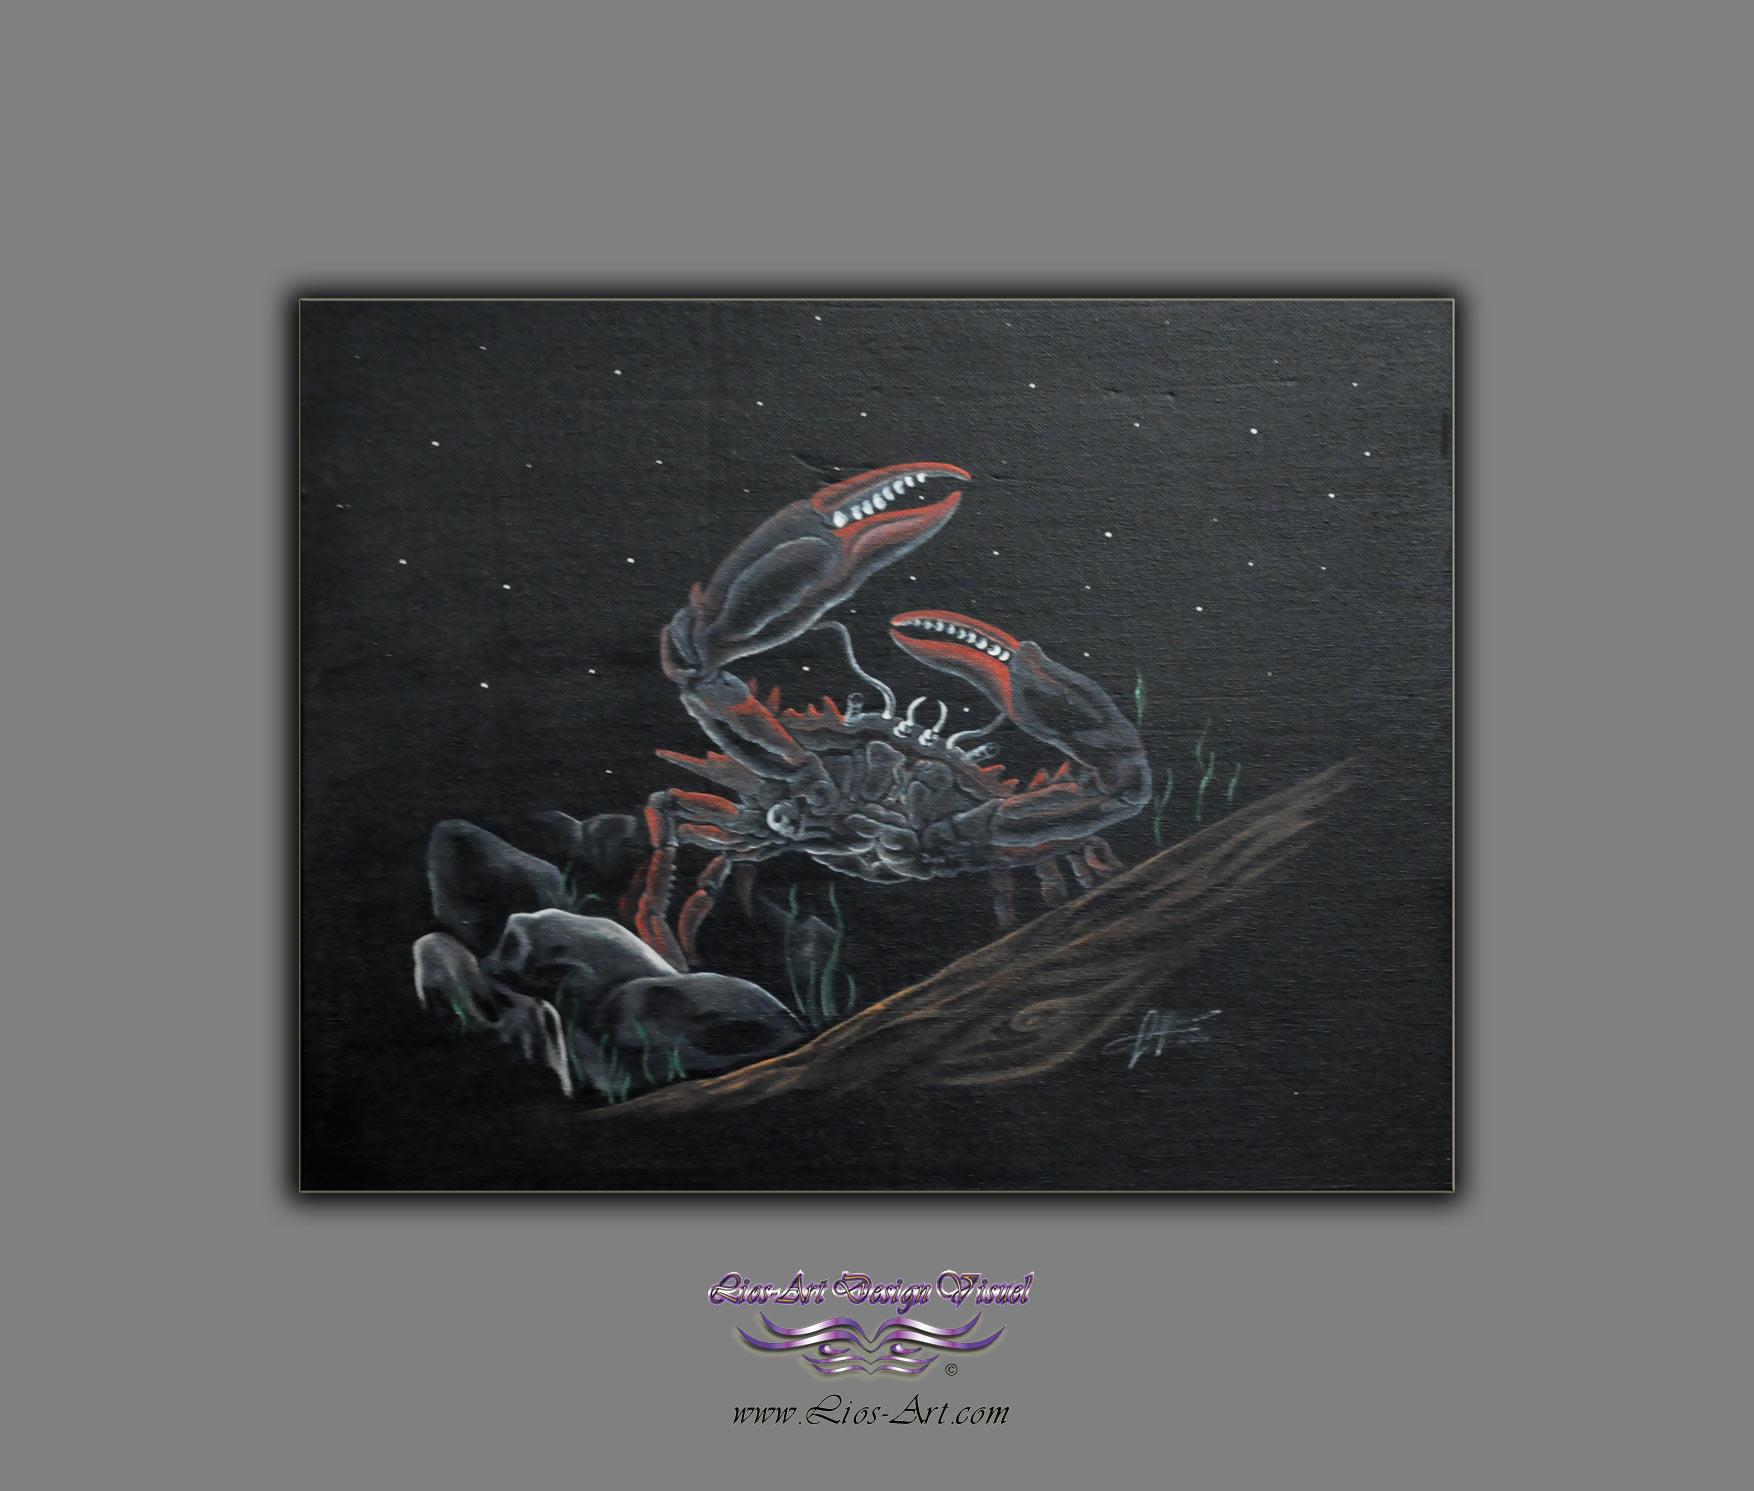 crabe-jean-chrisian3.jpg